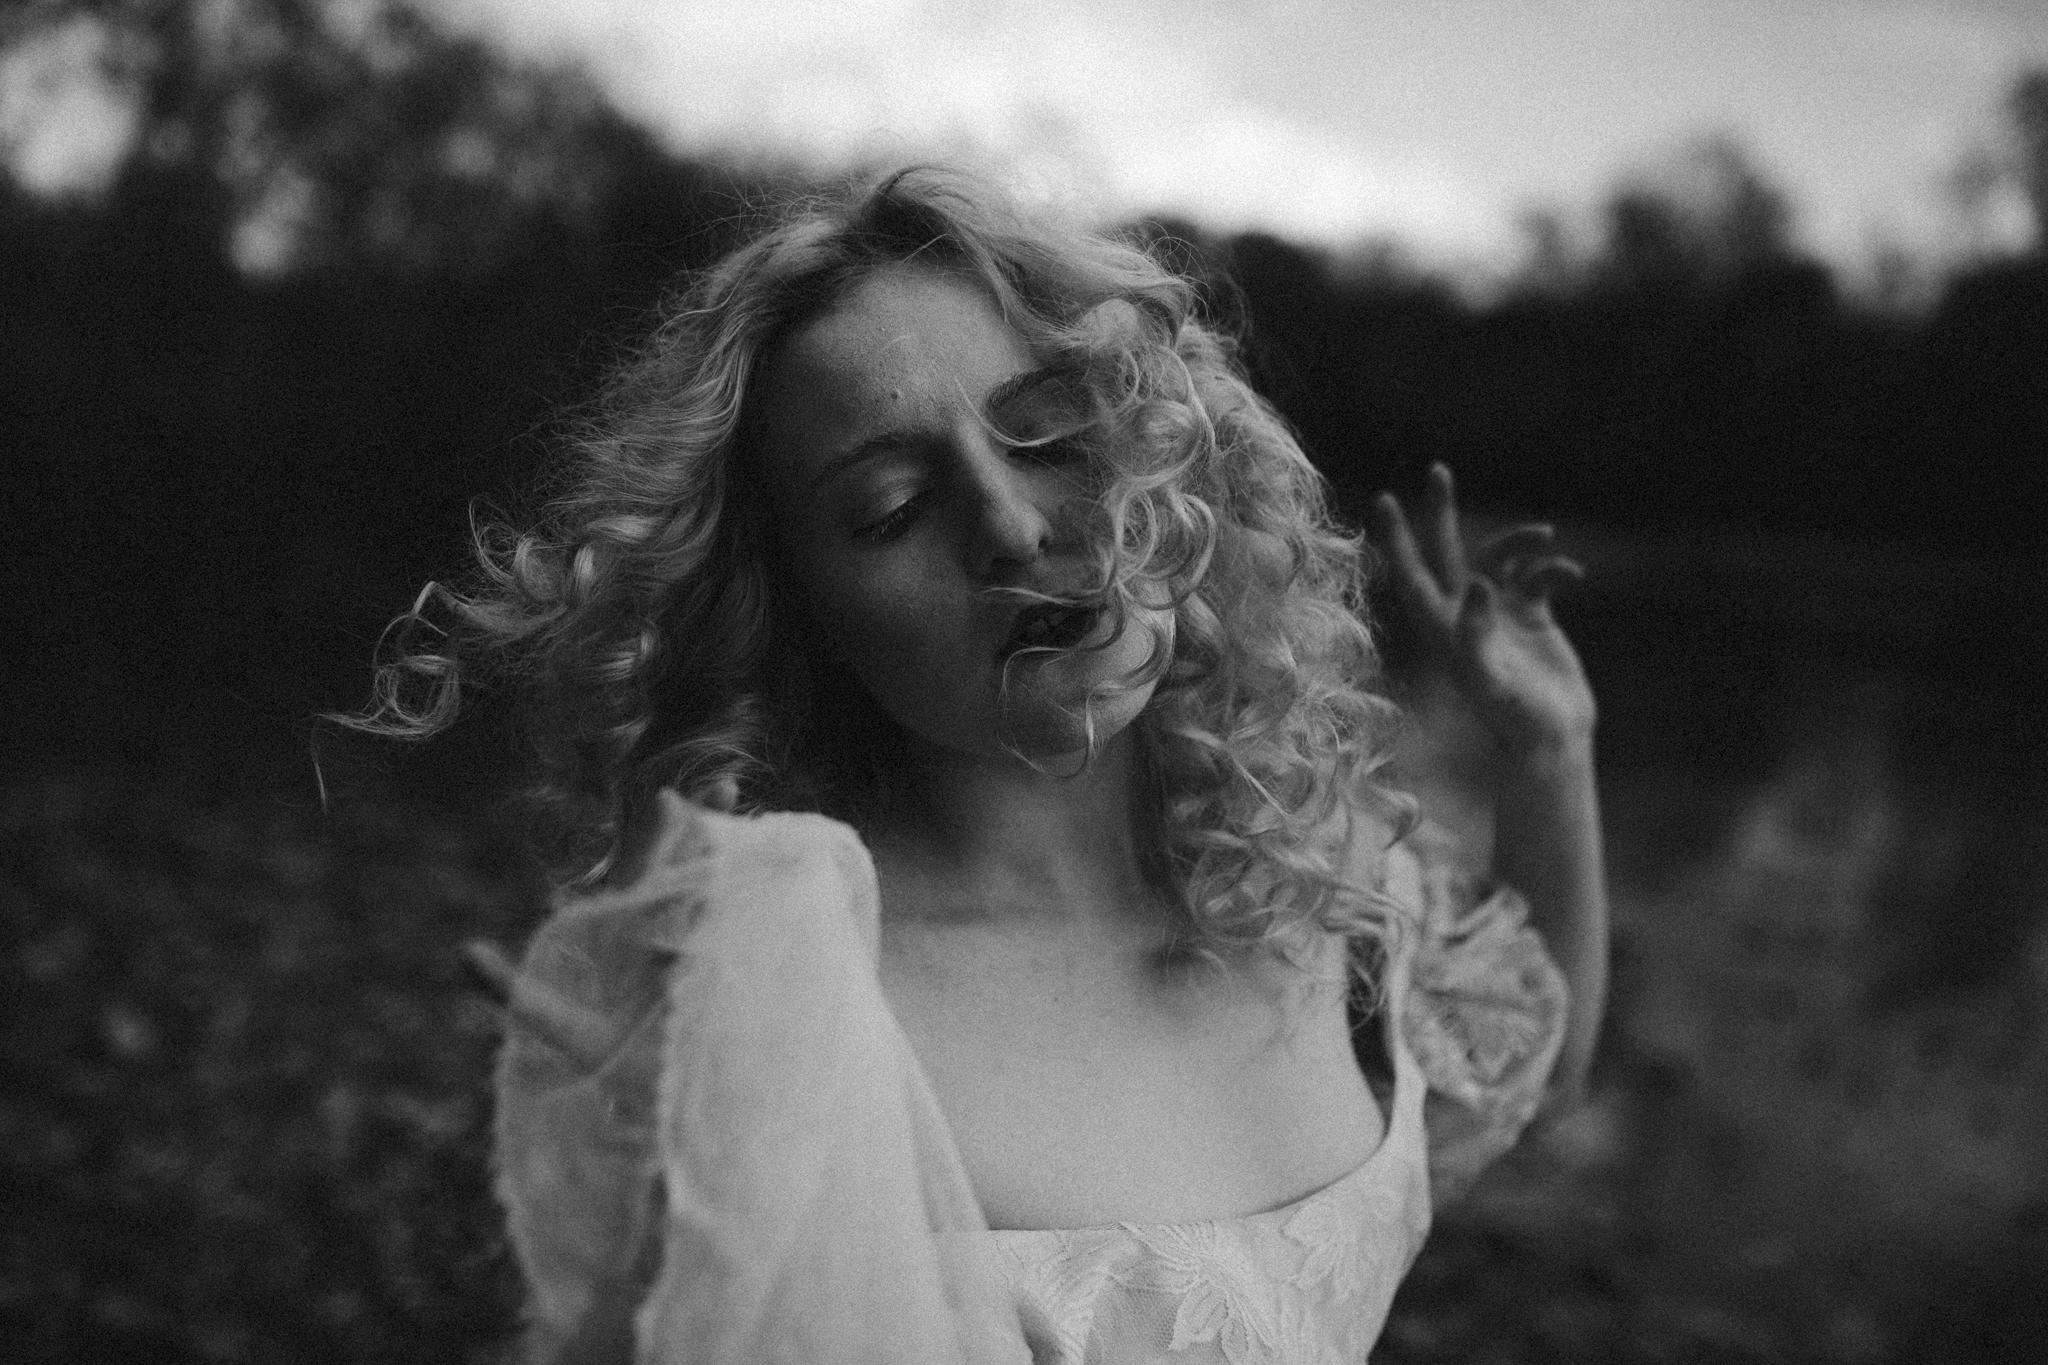 pale-witch-255fb.jpg